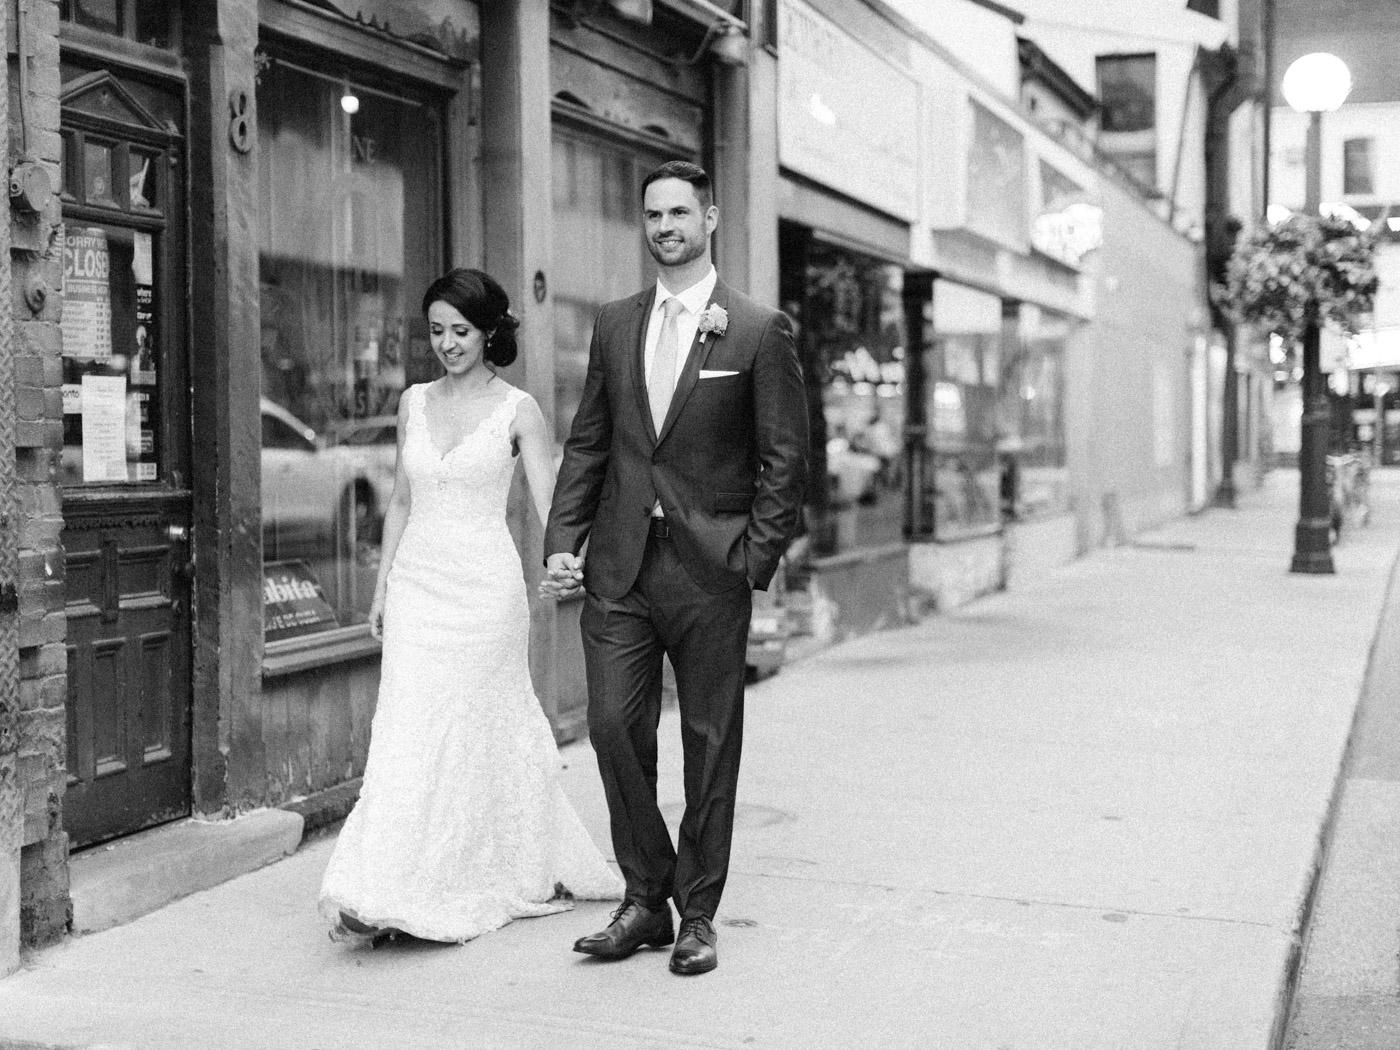 toronto_wedding_photographer_fine_art_documentary-466.jpg